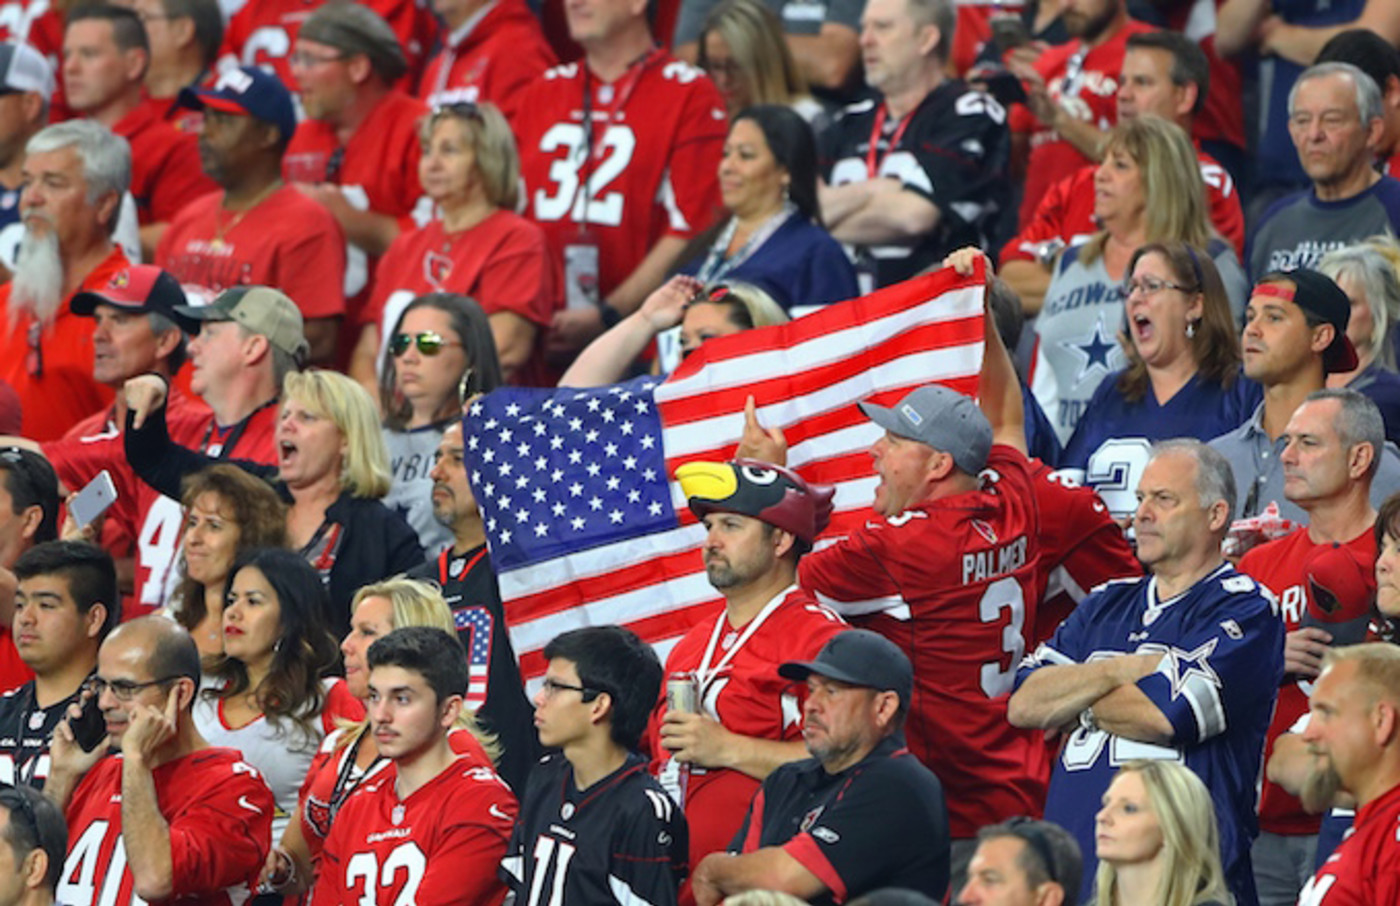 Arizona Cardinals fans hold an american flag.